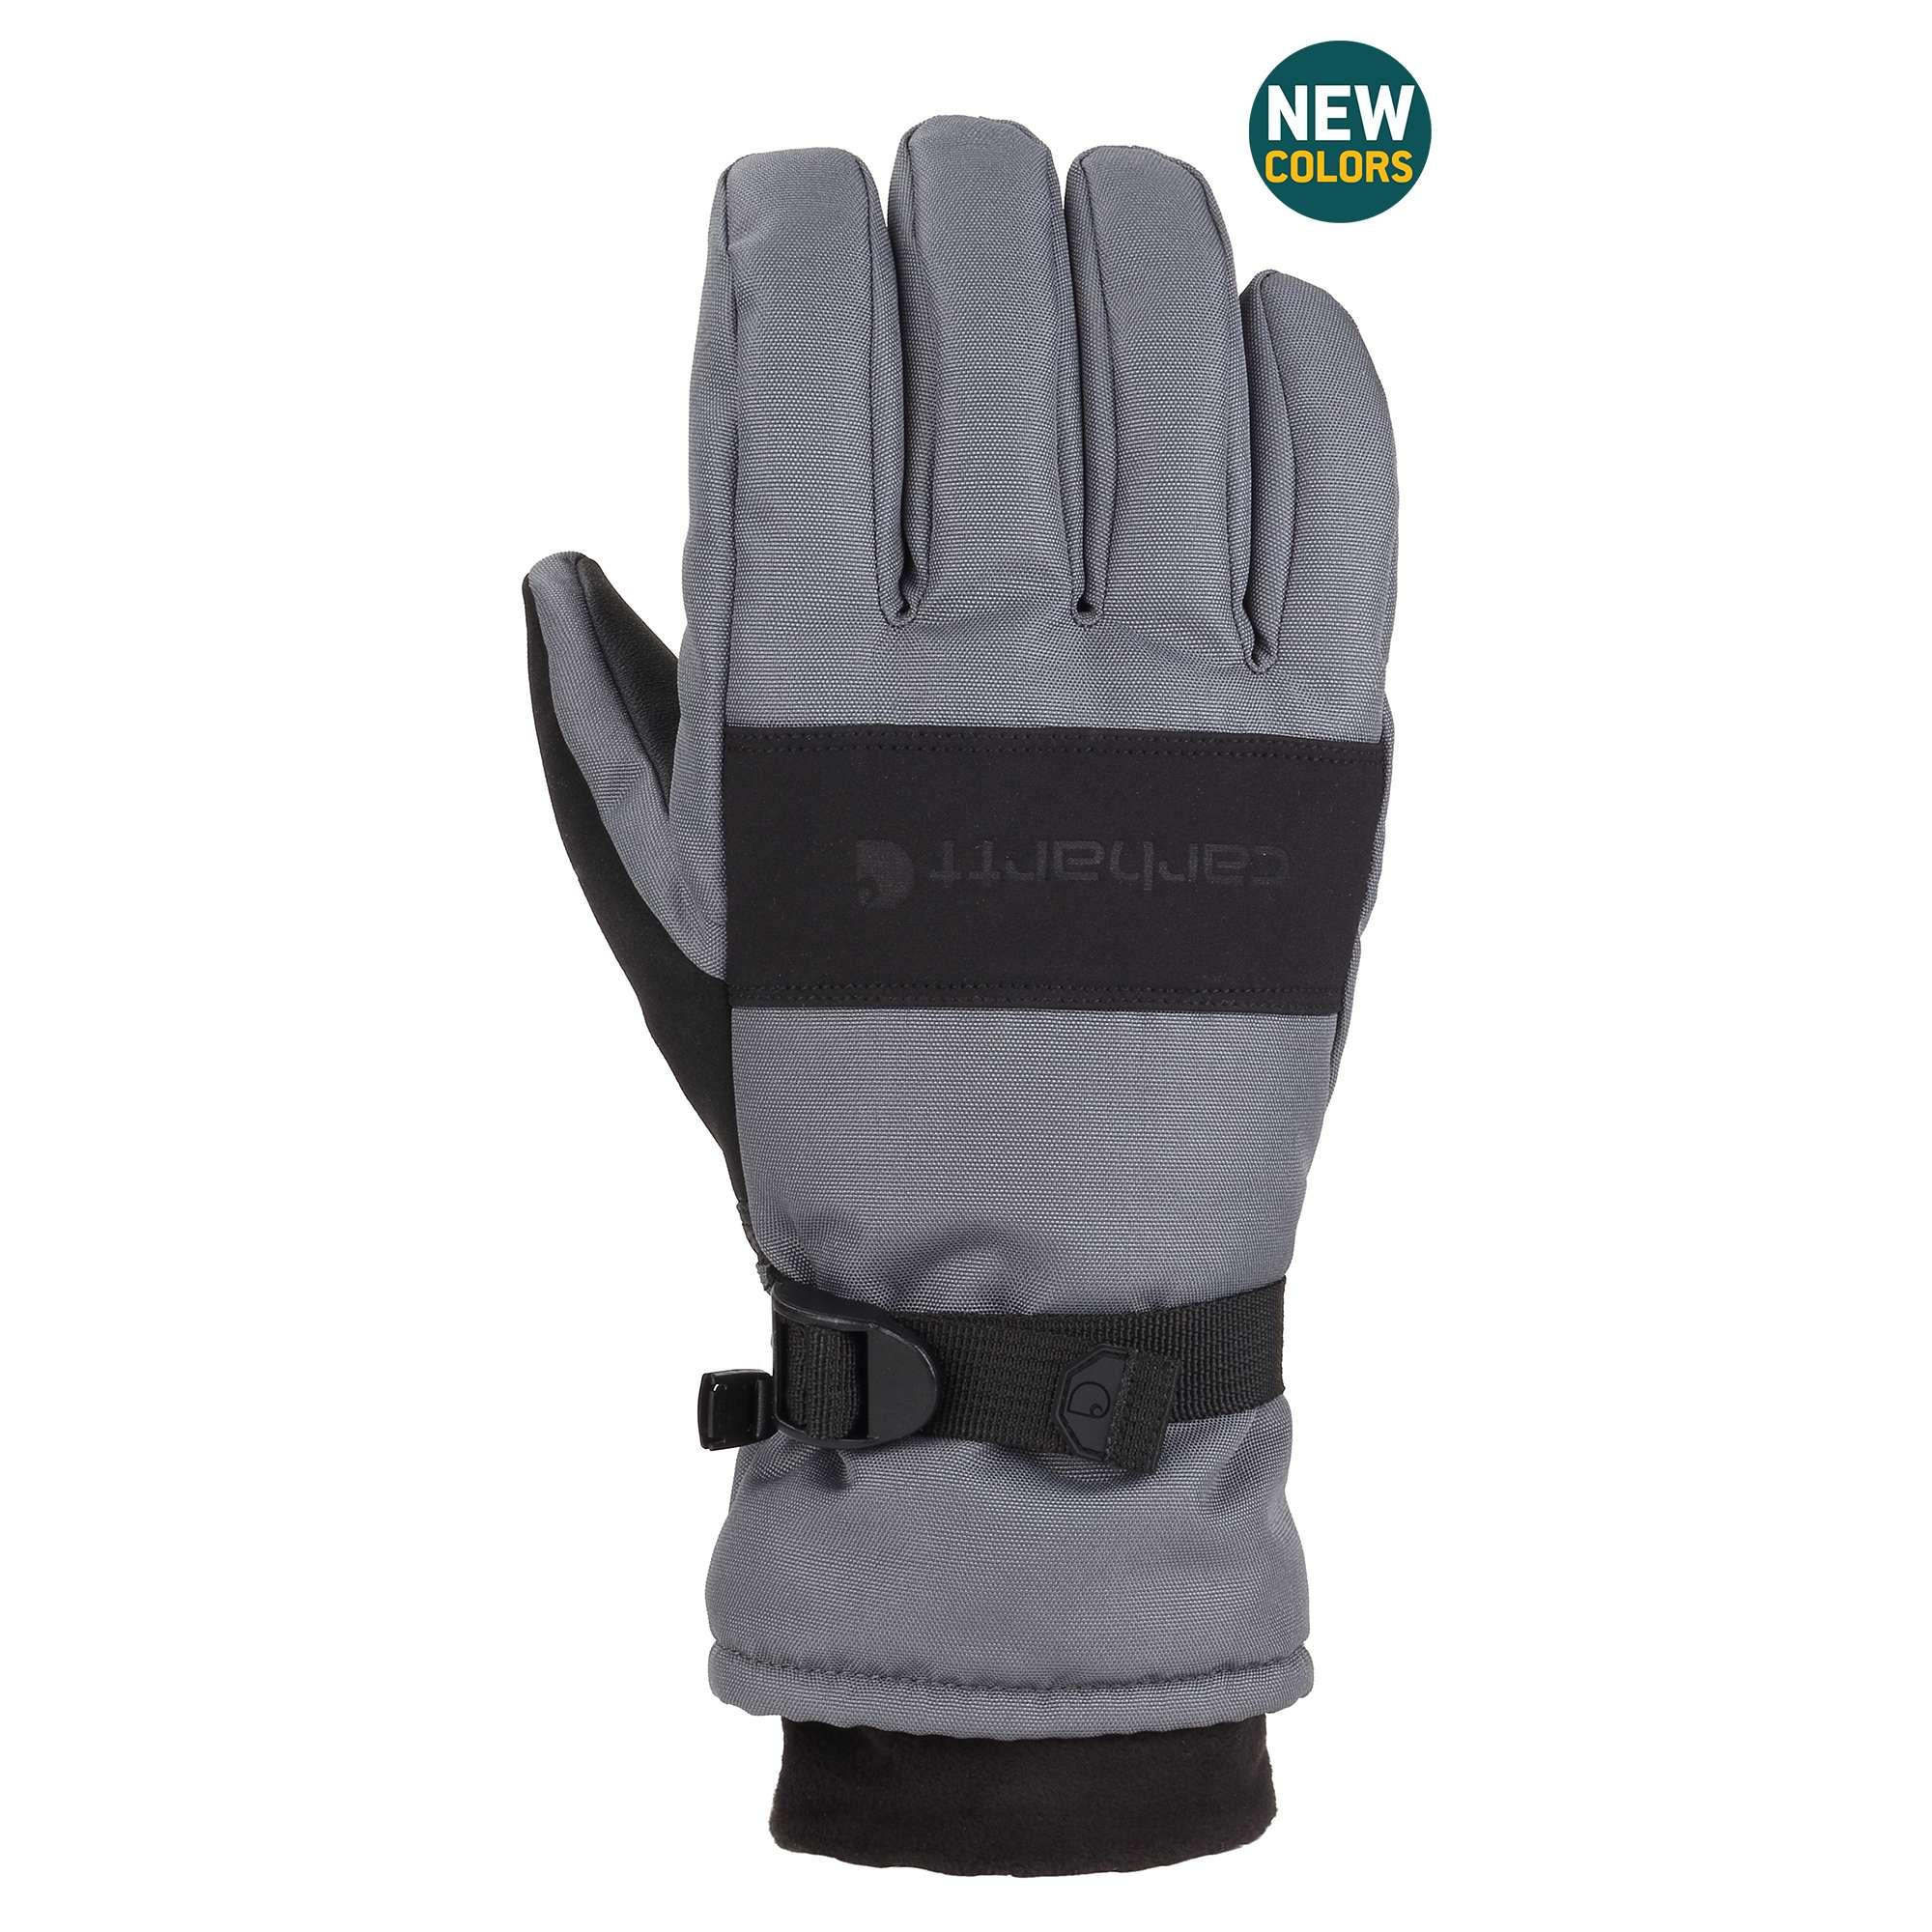 Carhartt Waterproof Insulated Glove